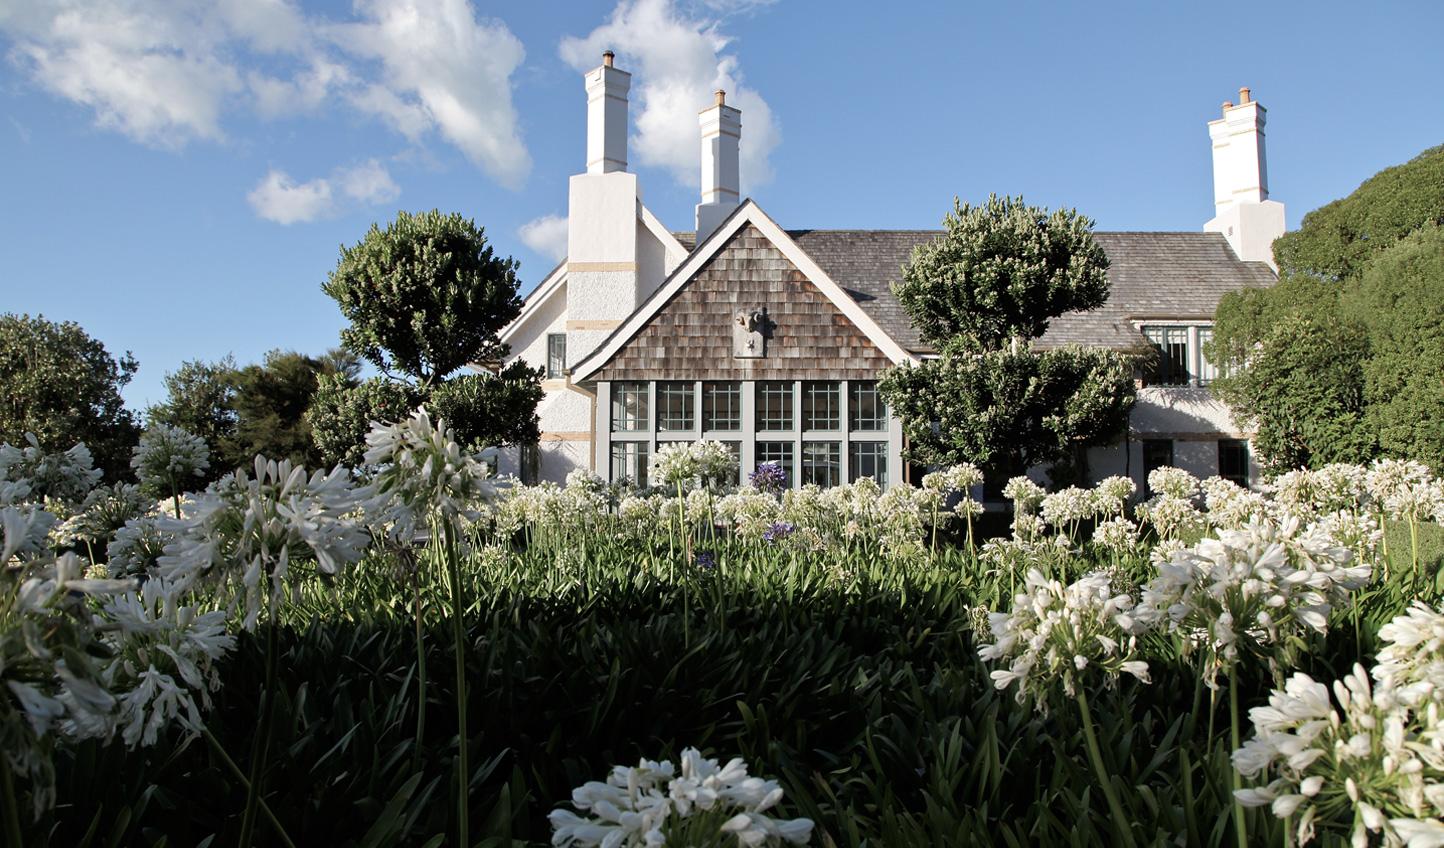 Wharekauhau Lodge is surrounded by nothing but 3,000 acres of farmland